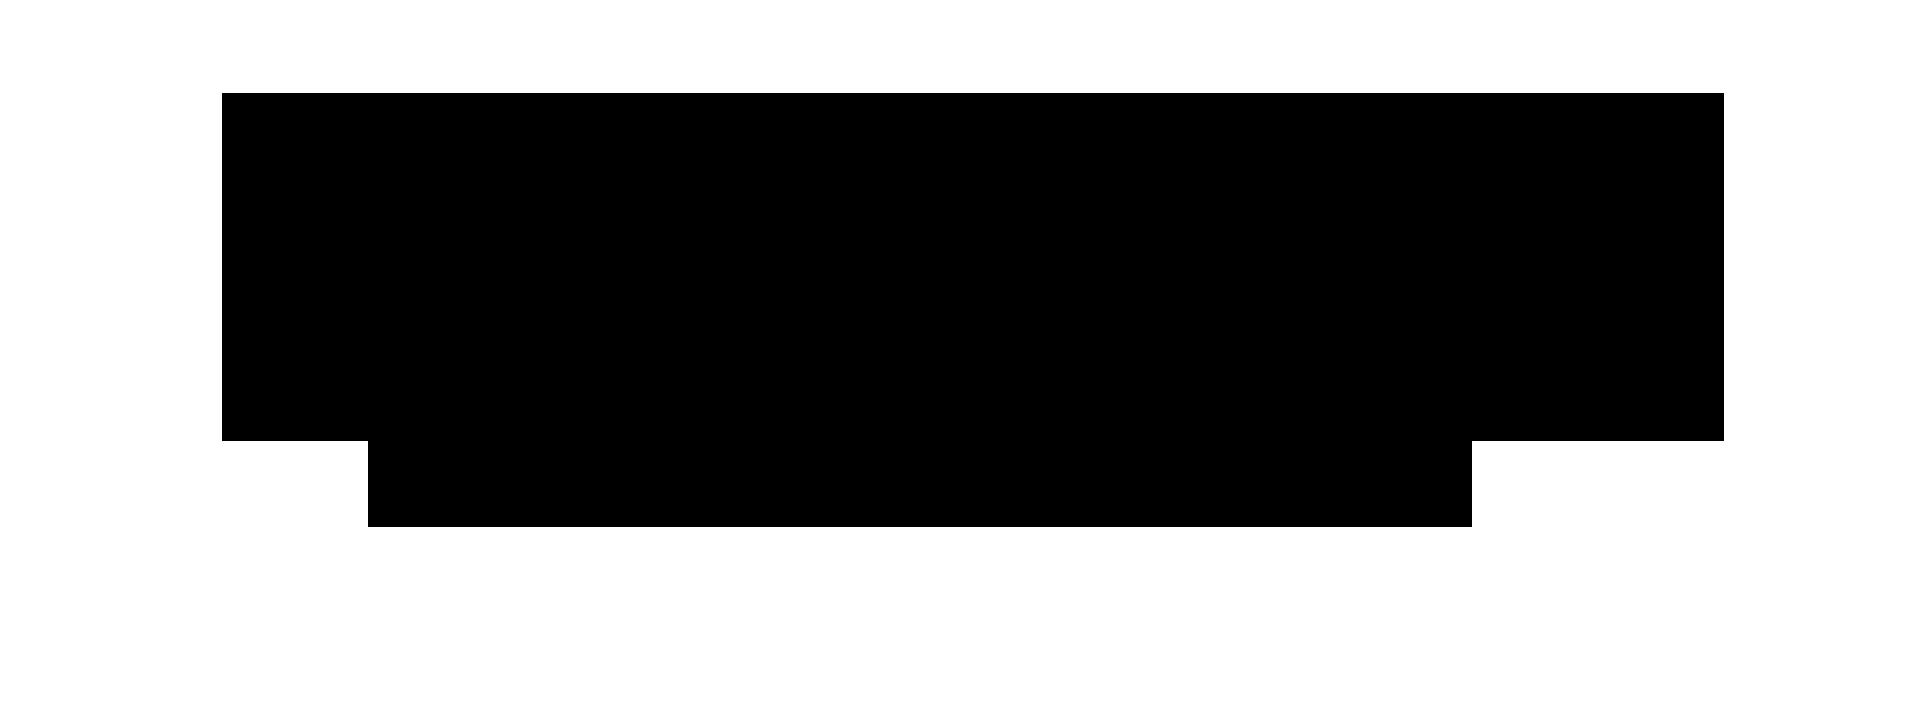 leroy-studio-etienne-deloraine-logo-black